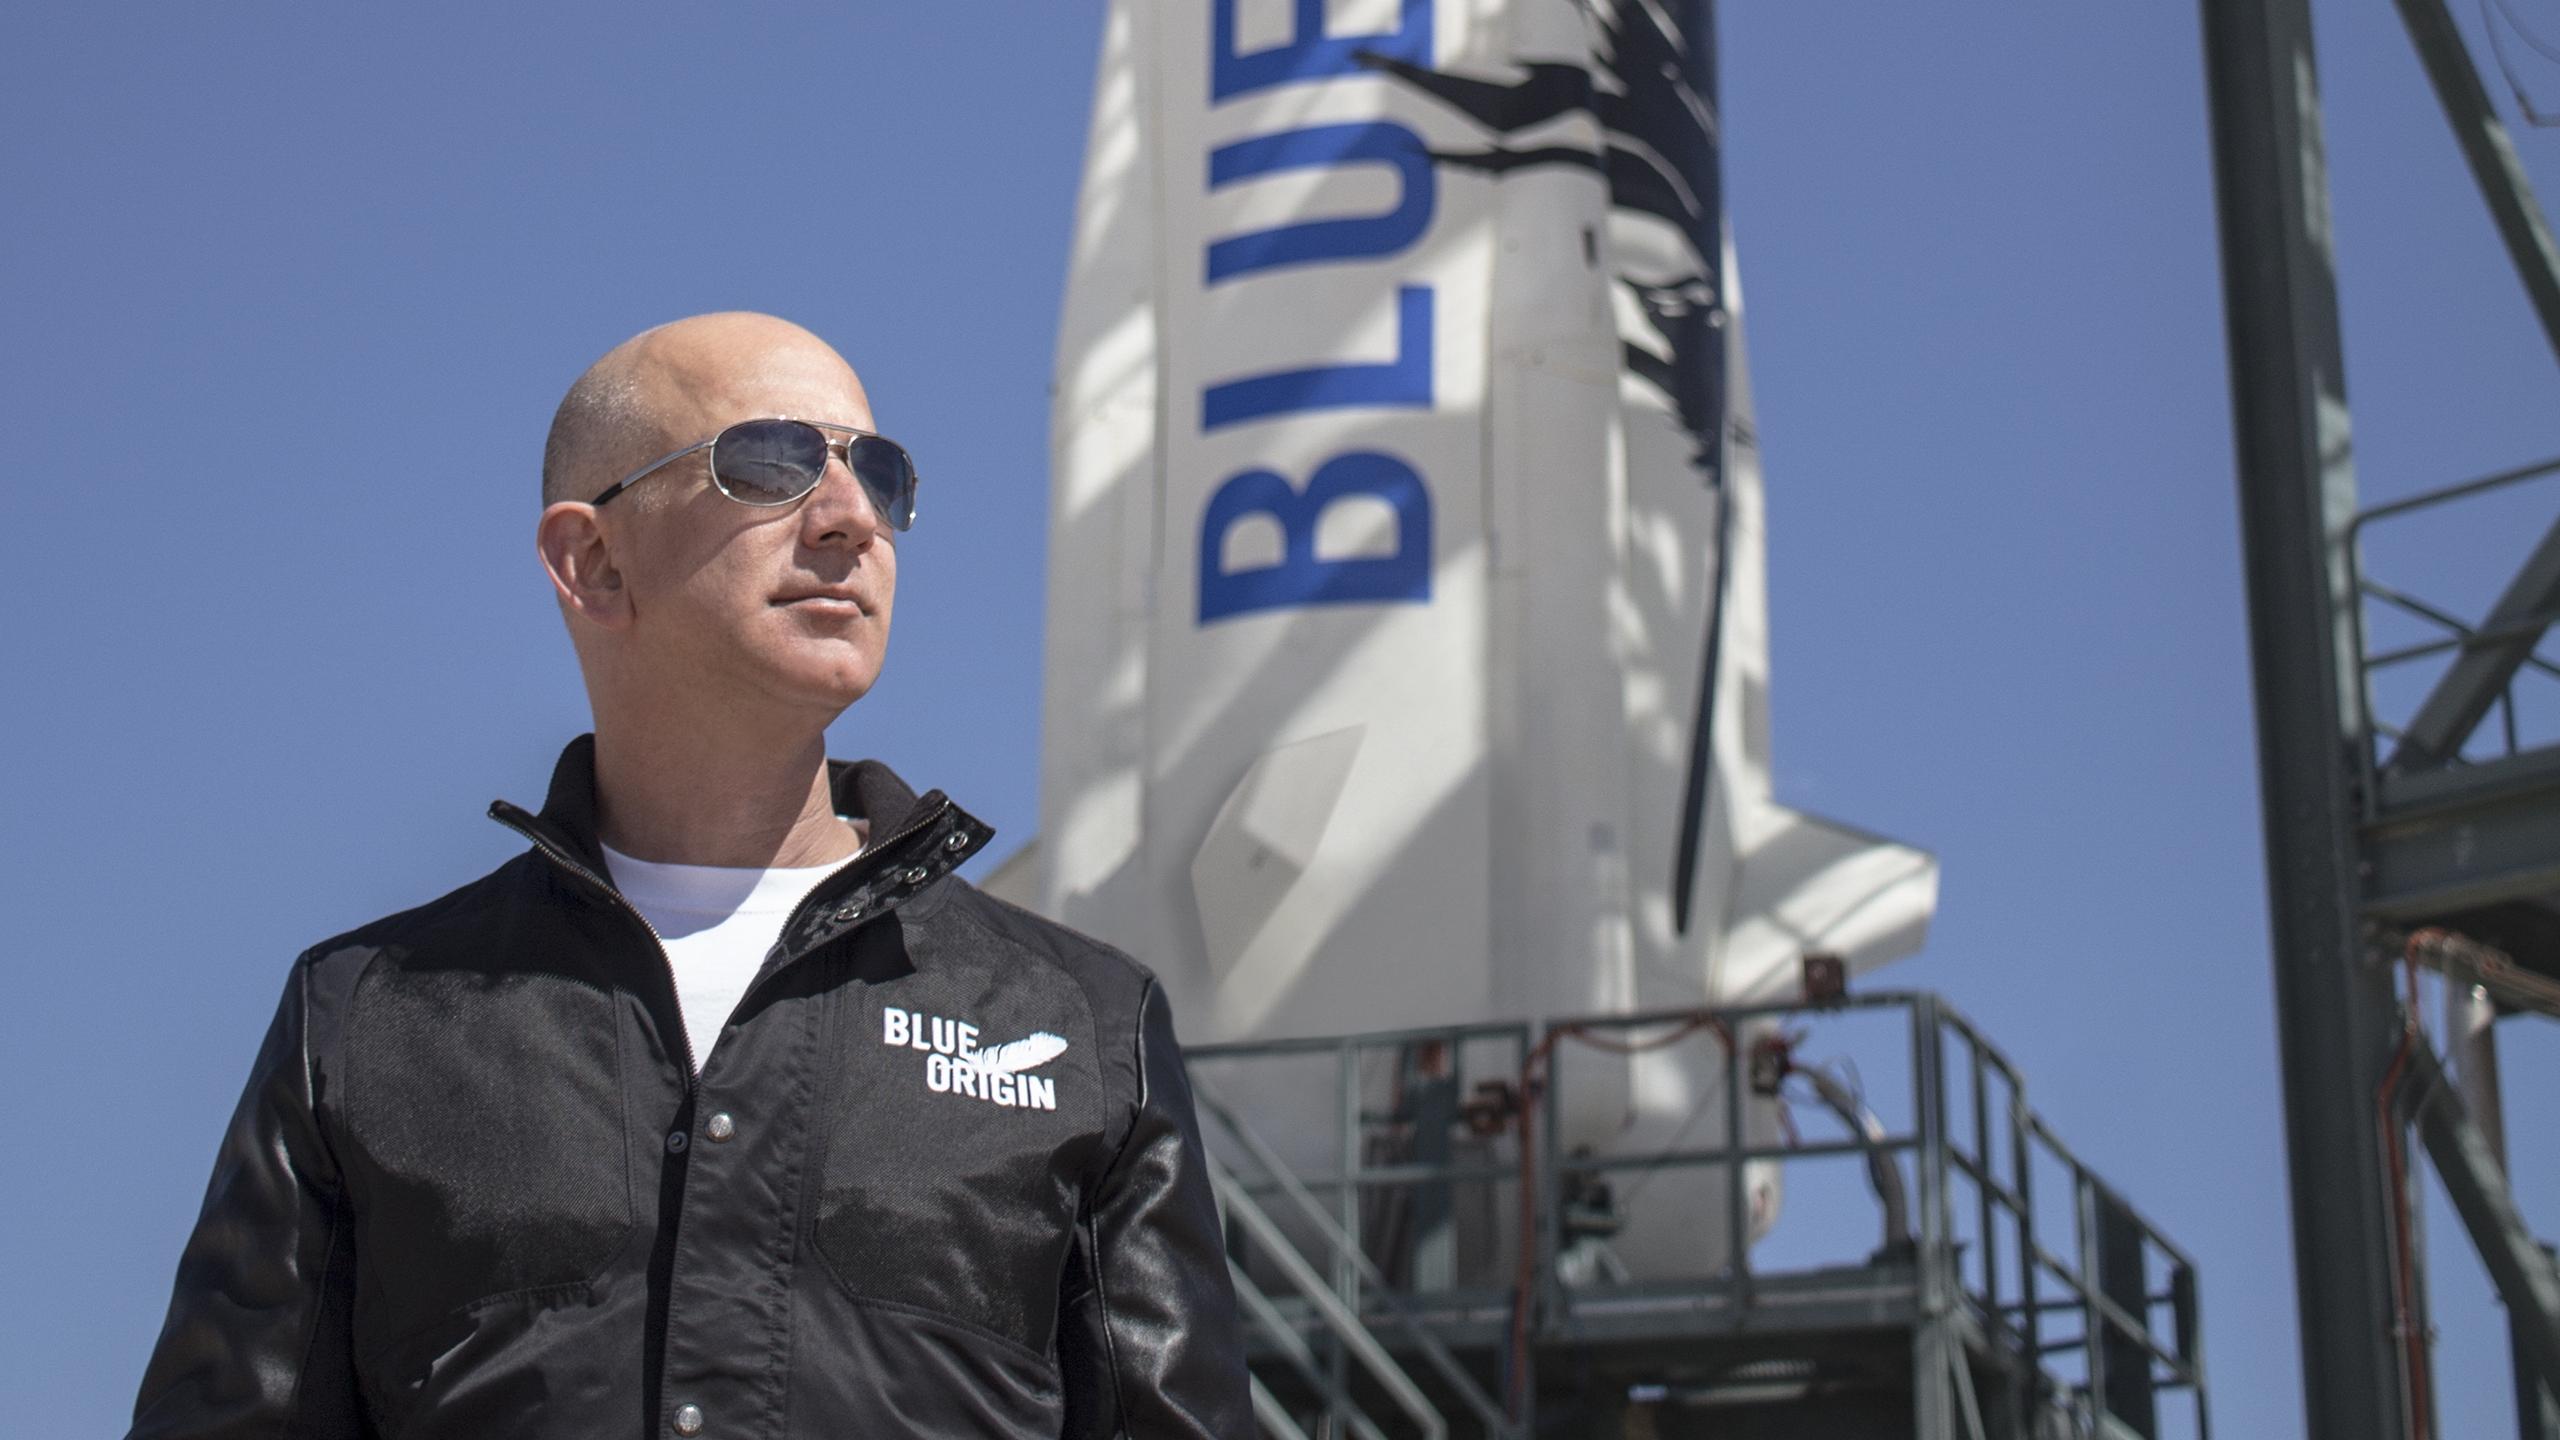 Blue Origin de Jeff Bezos aspira a enviar pasajeros al espacio para abril